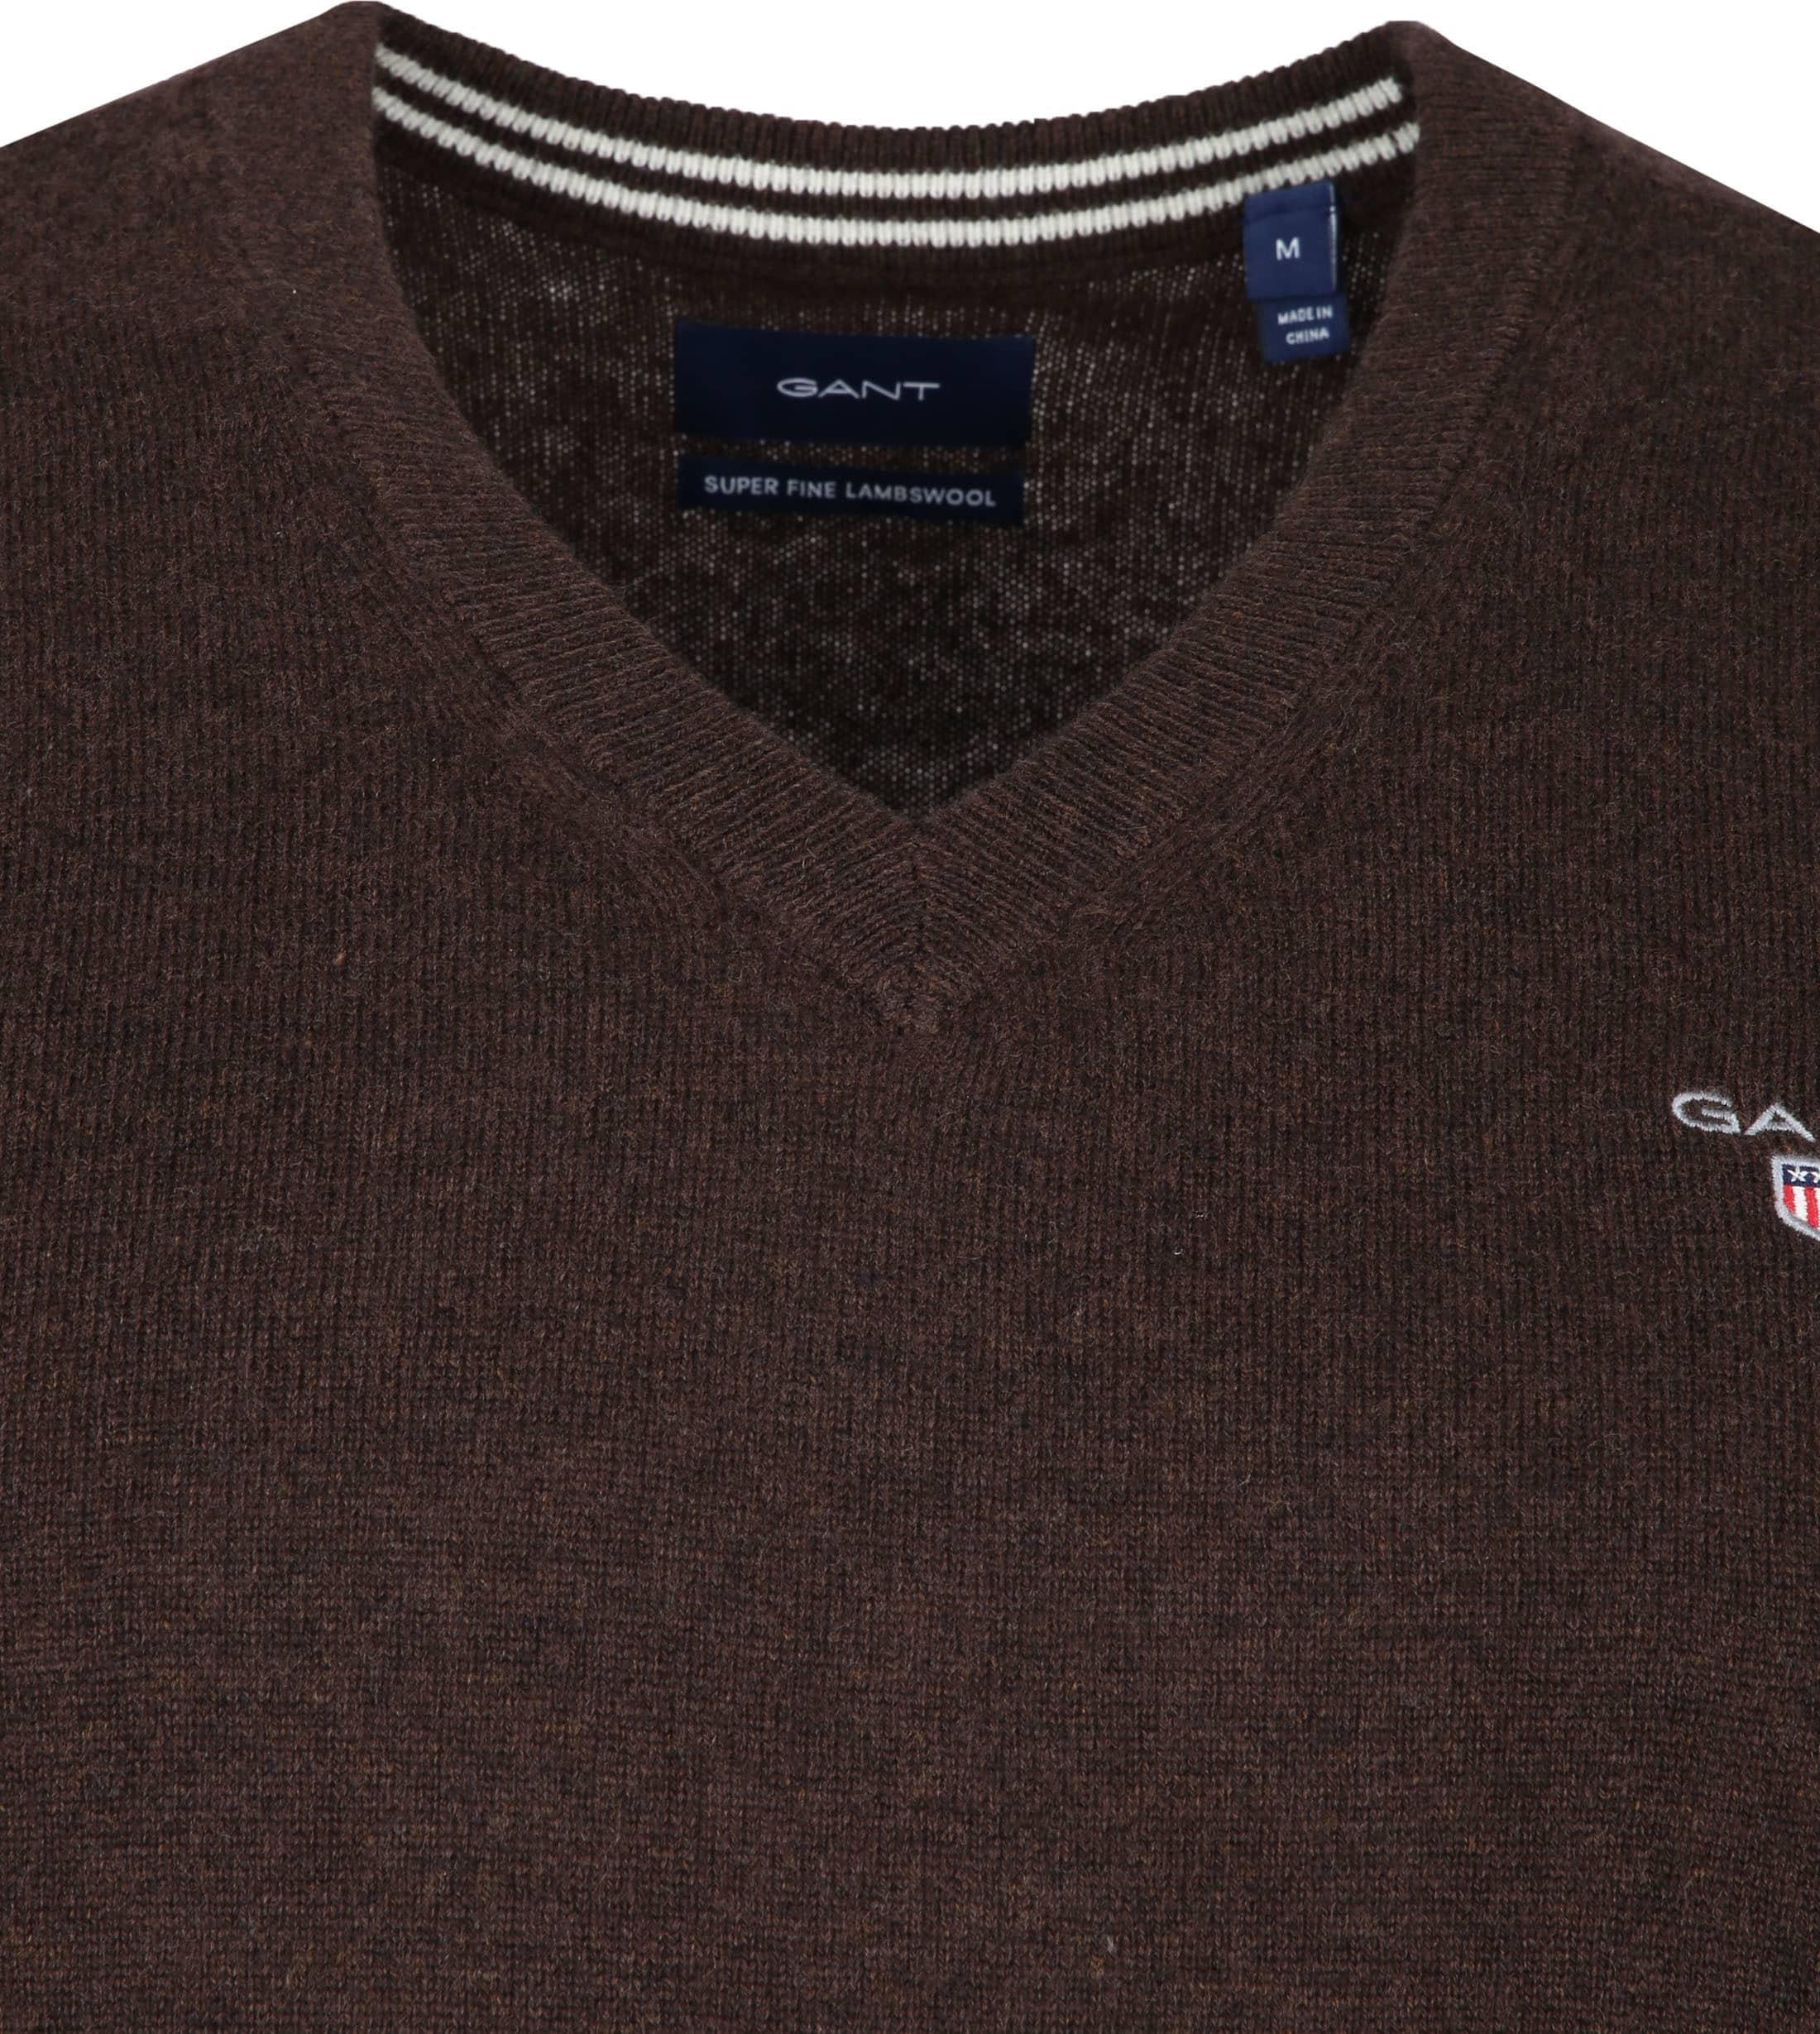 Gant Pullover Lambswool Dark Brown foto 1